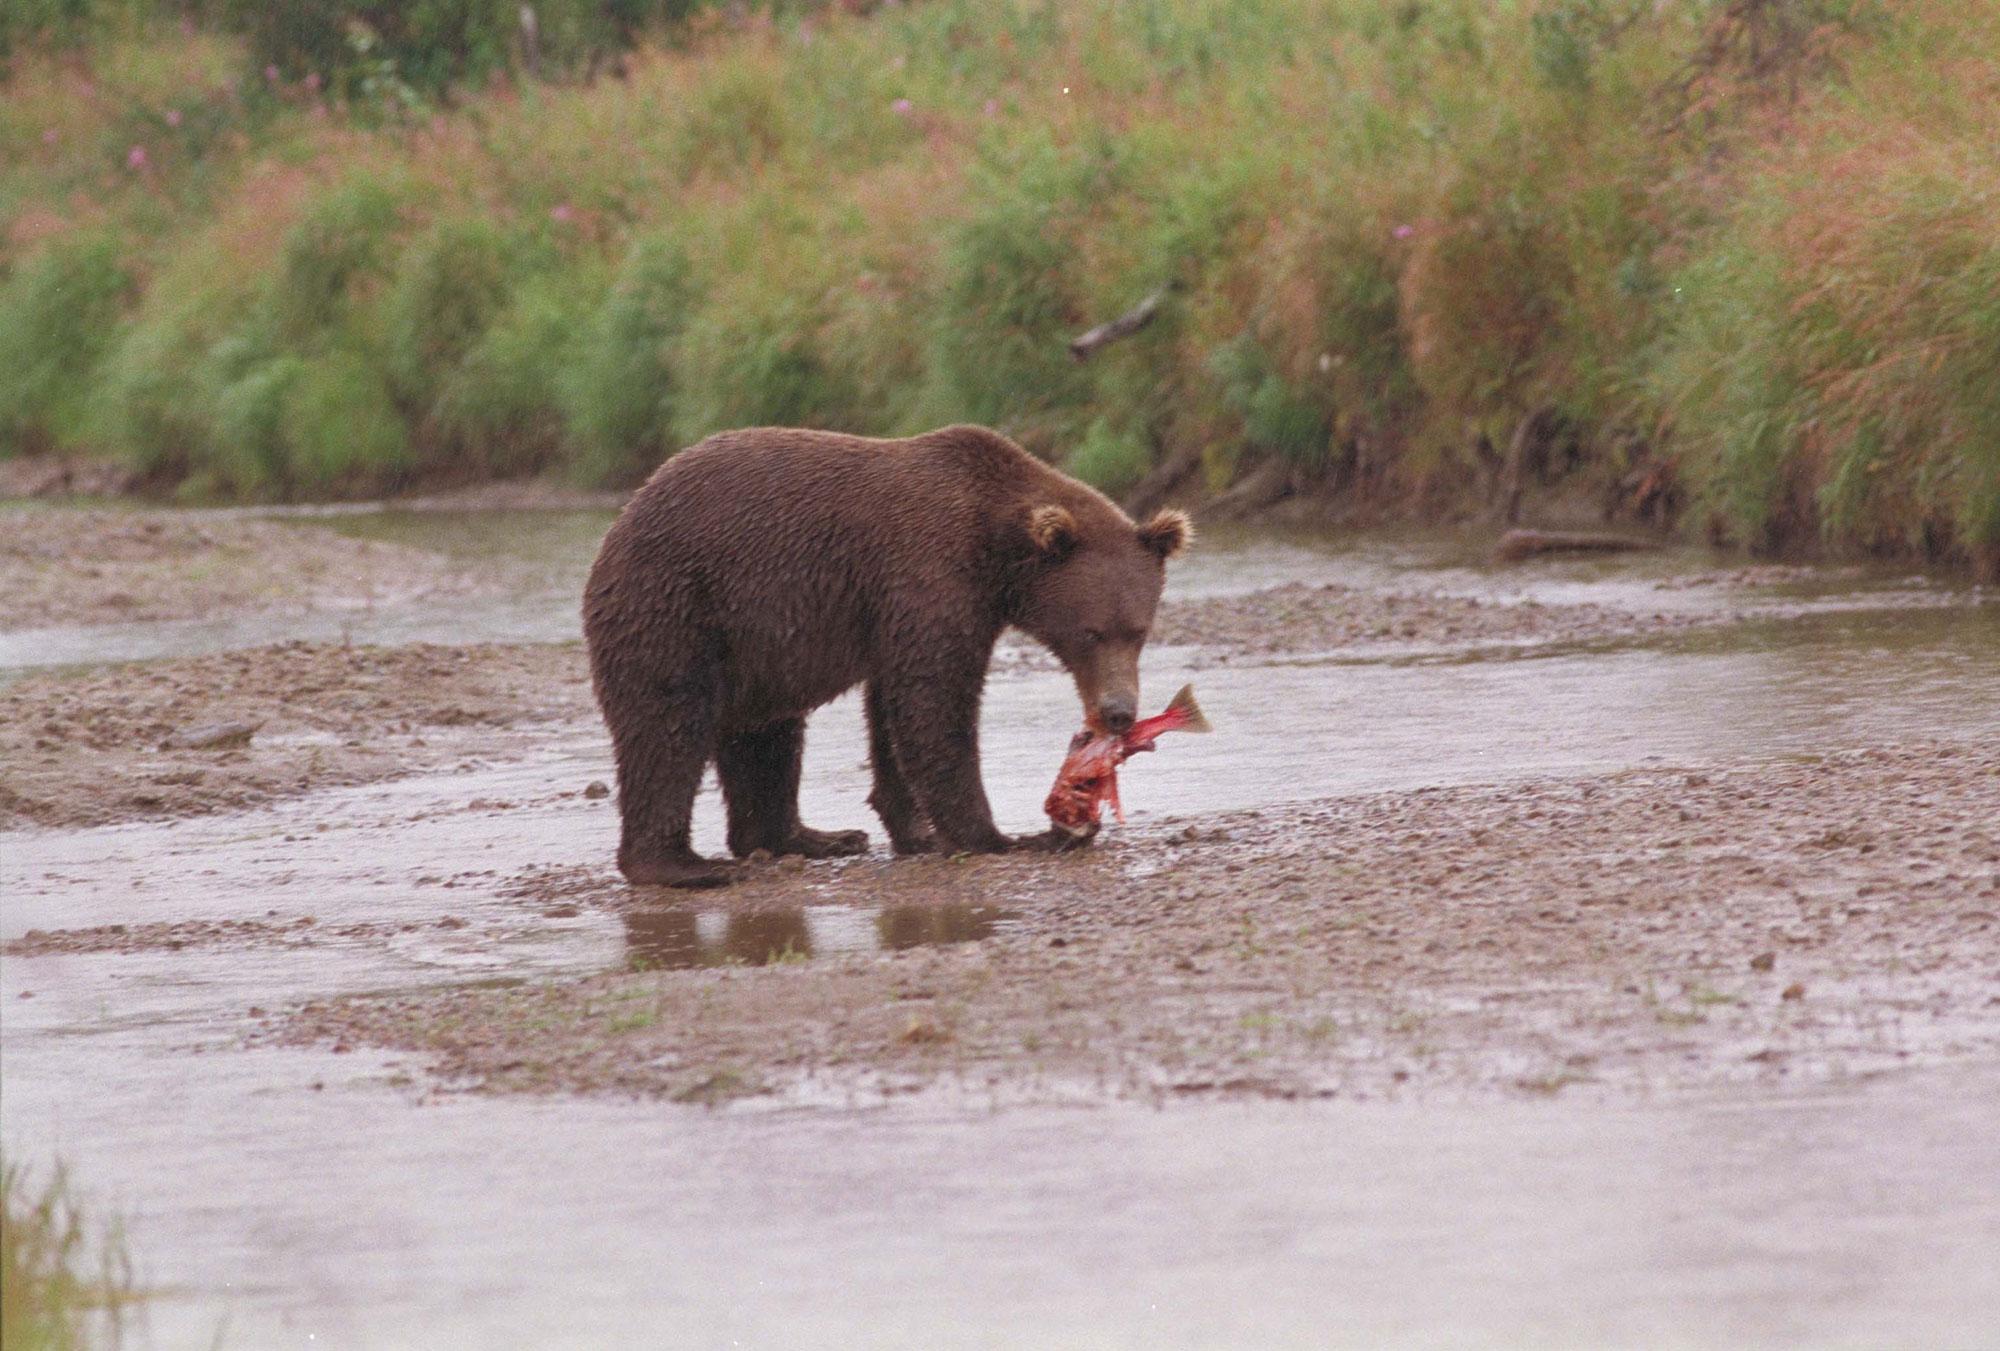 bear-eating-fish